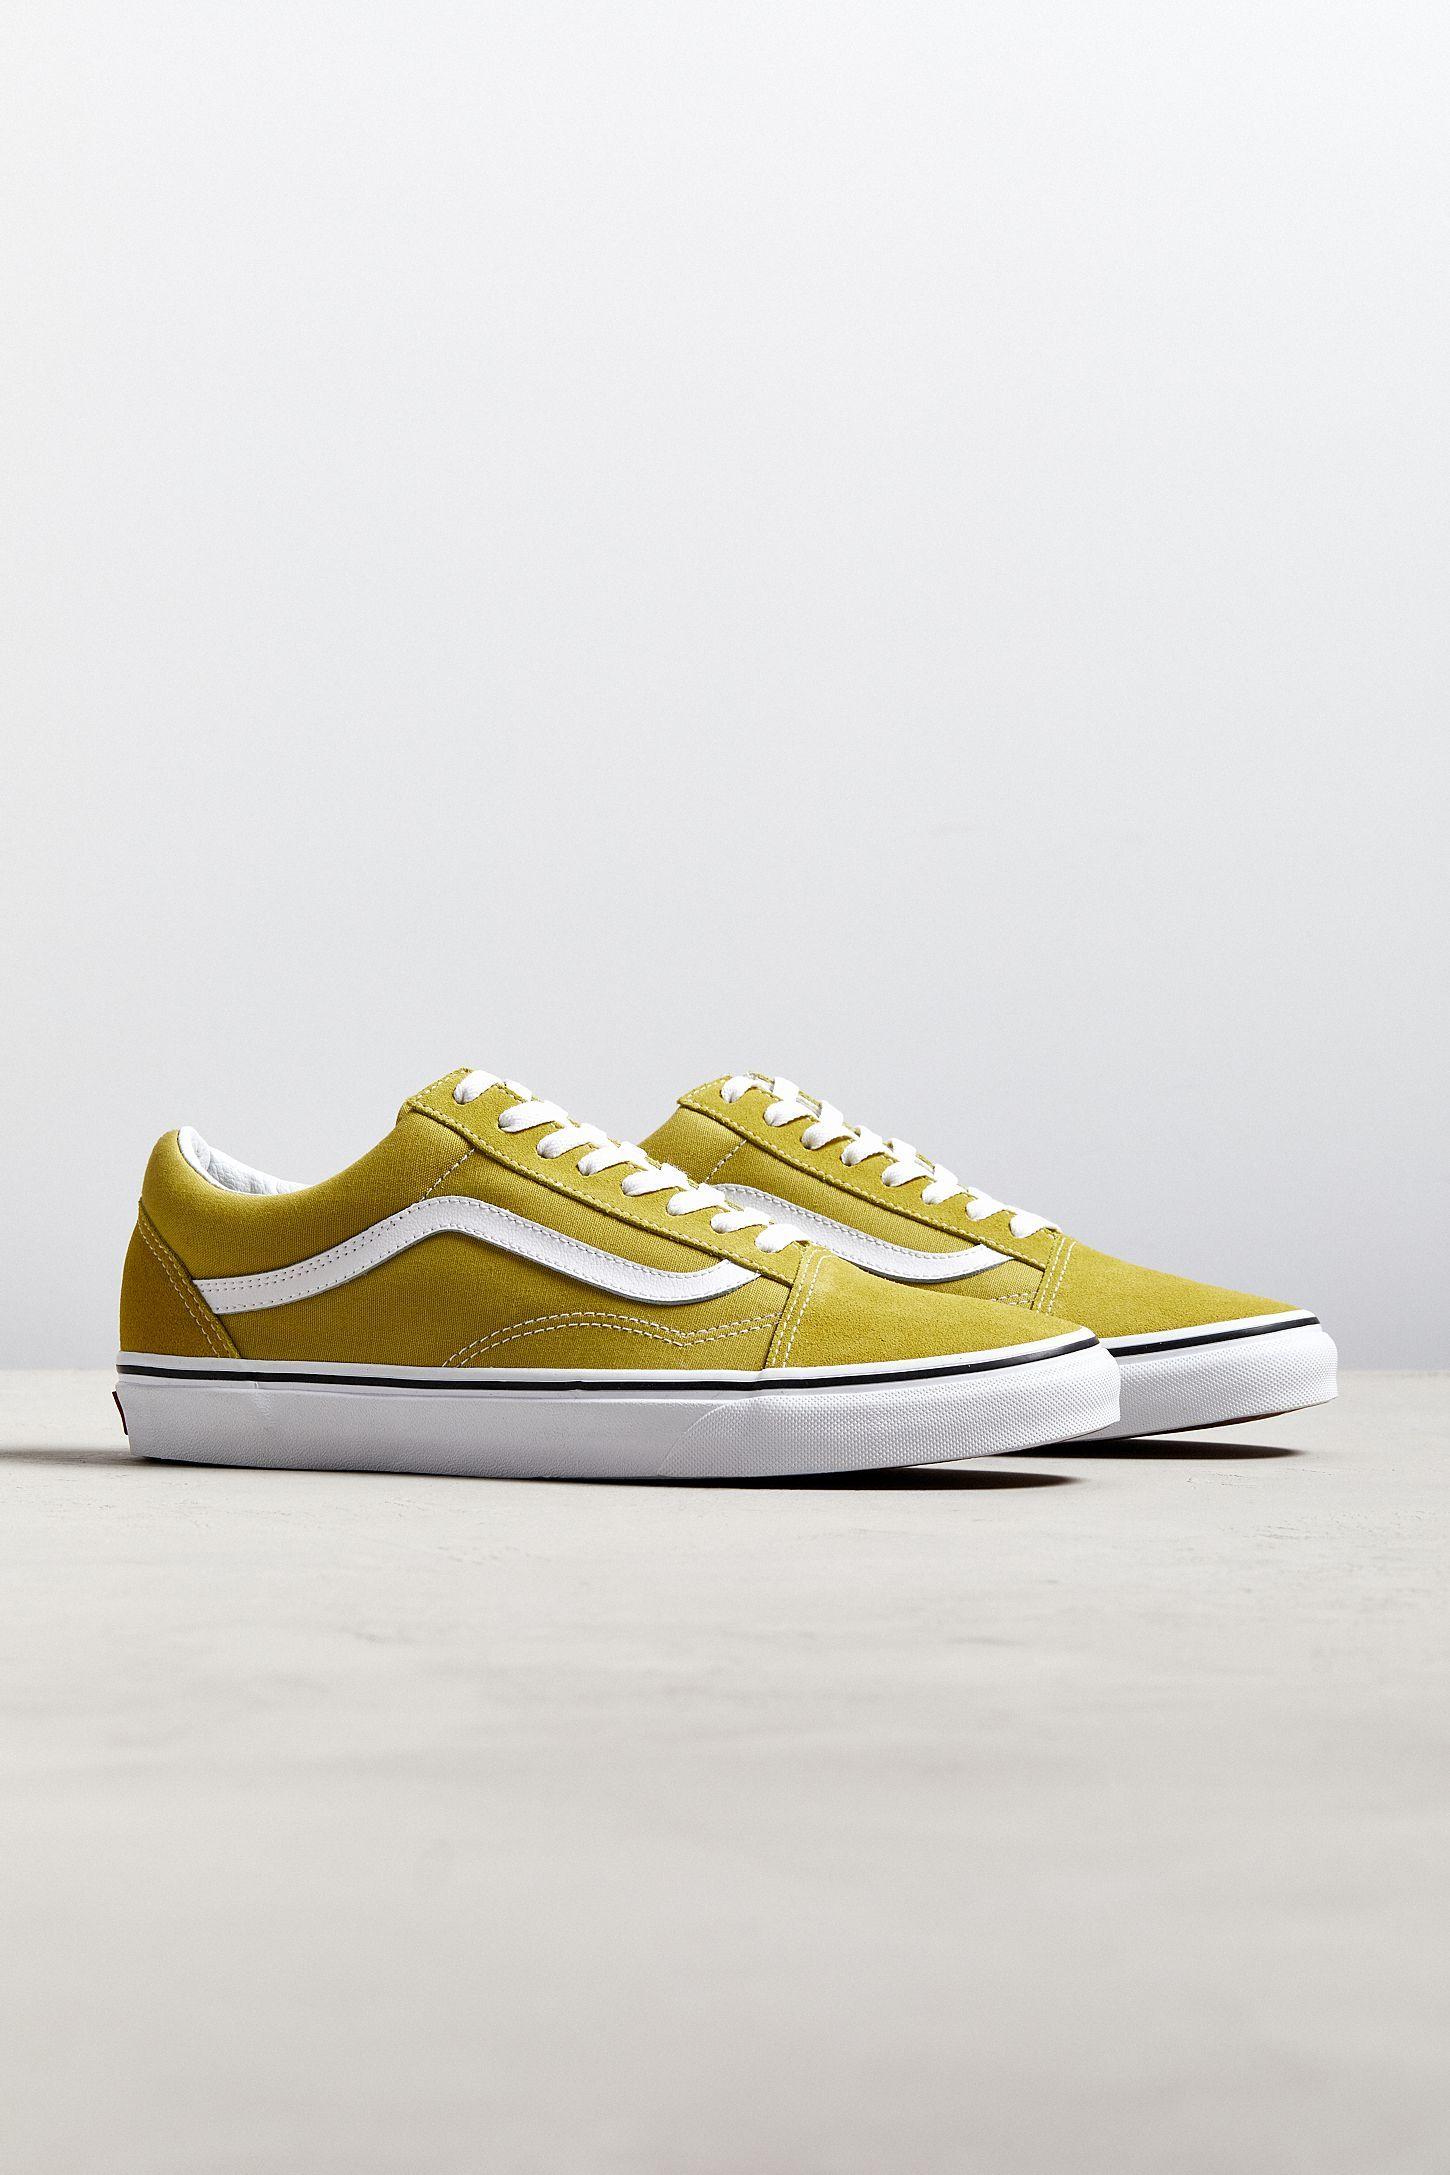 Jason Markk Quick Wipes in 2019 | Vans old skool, Vans, Sneakers